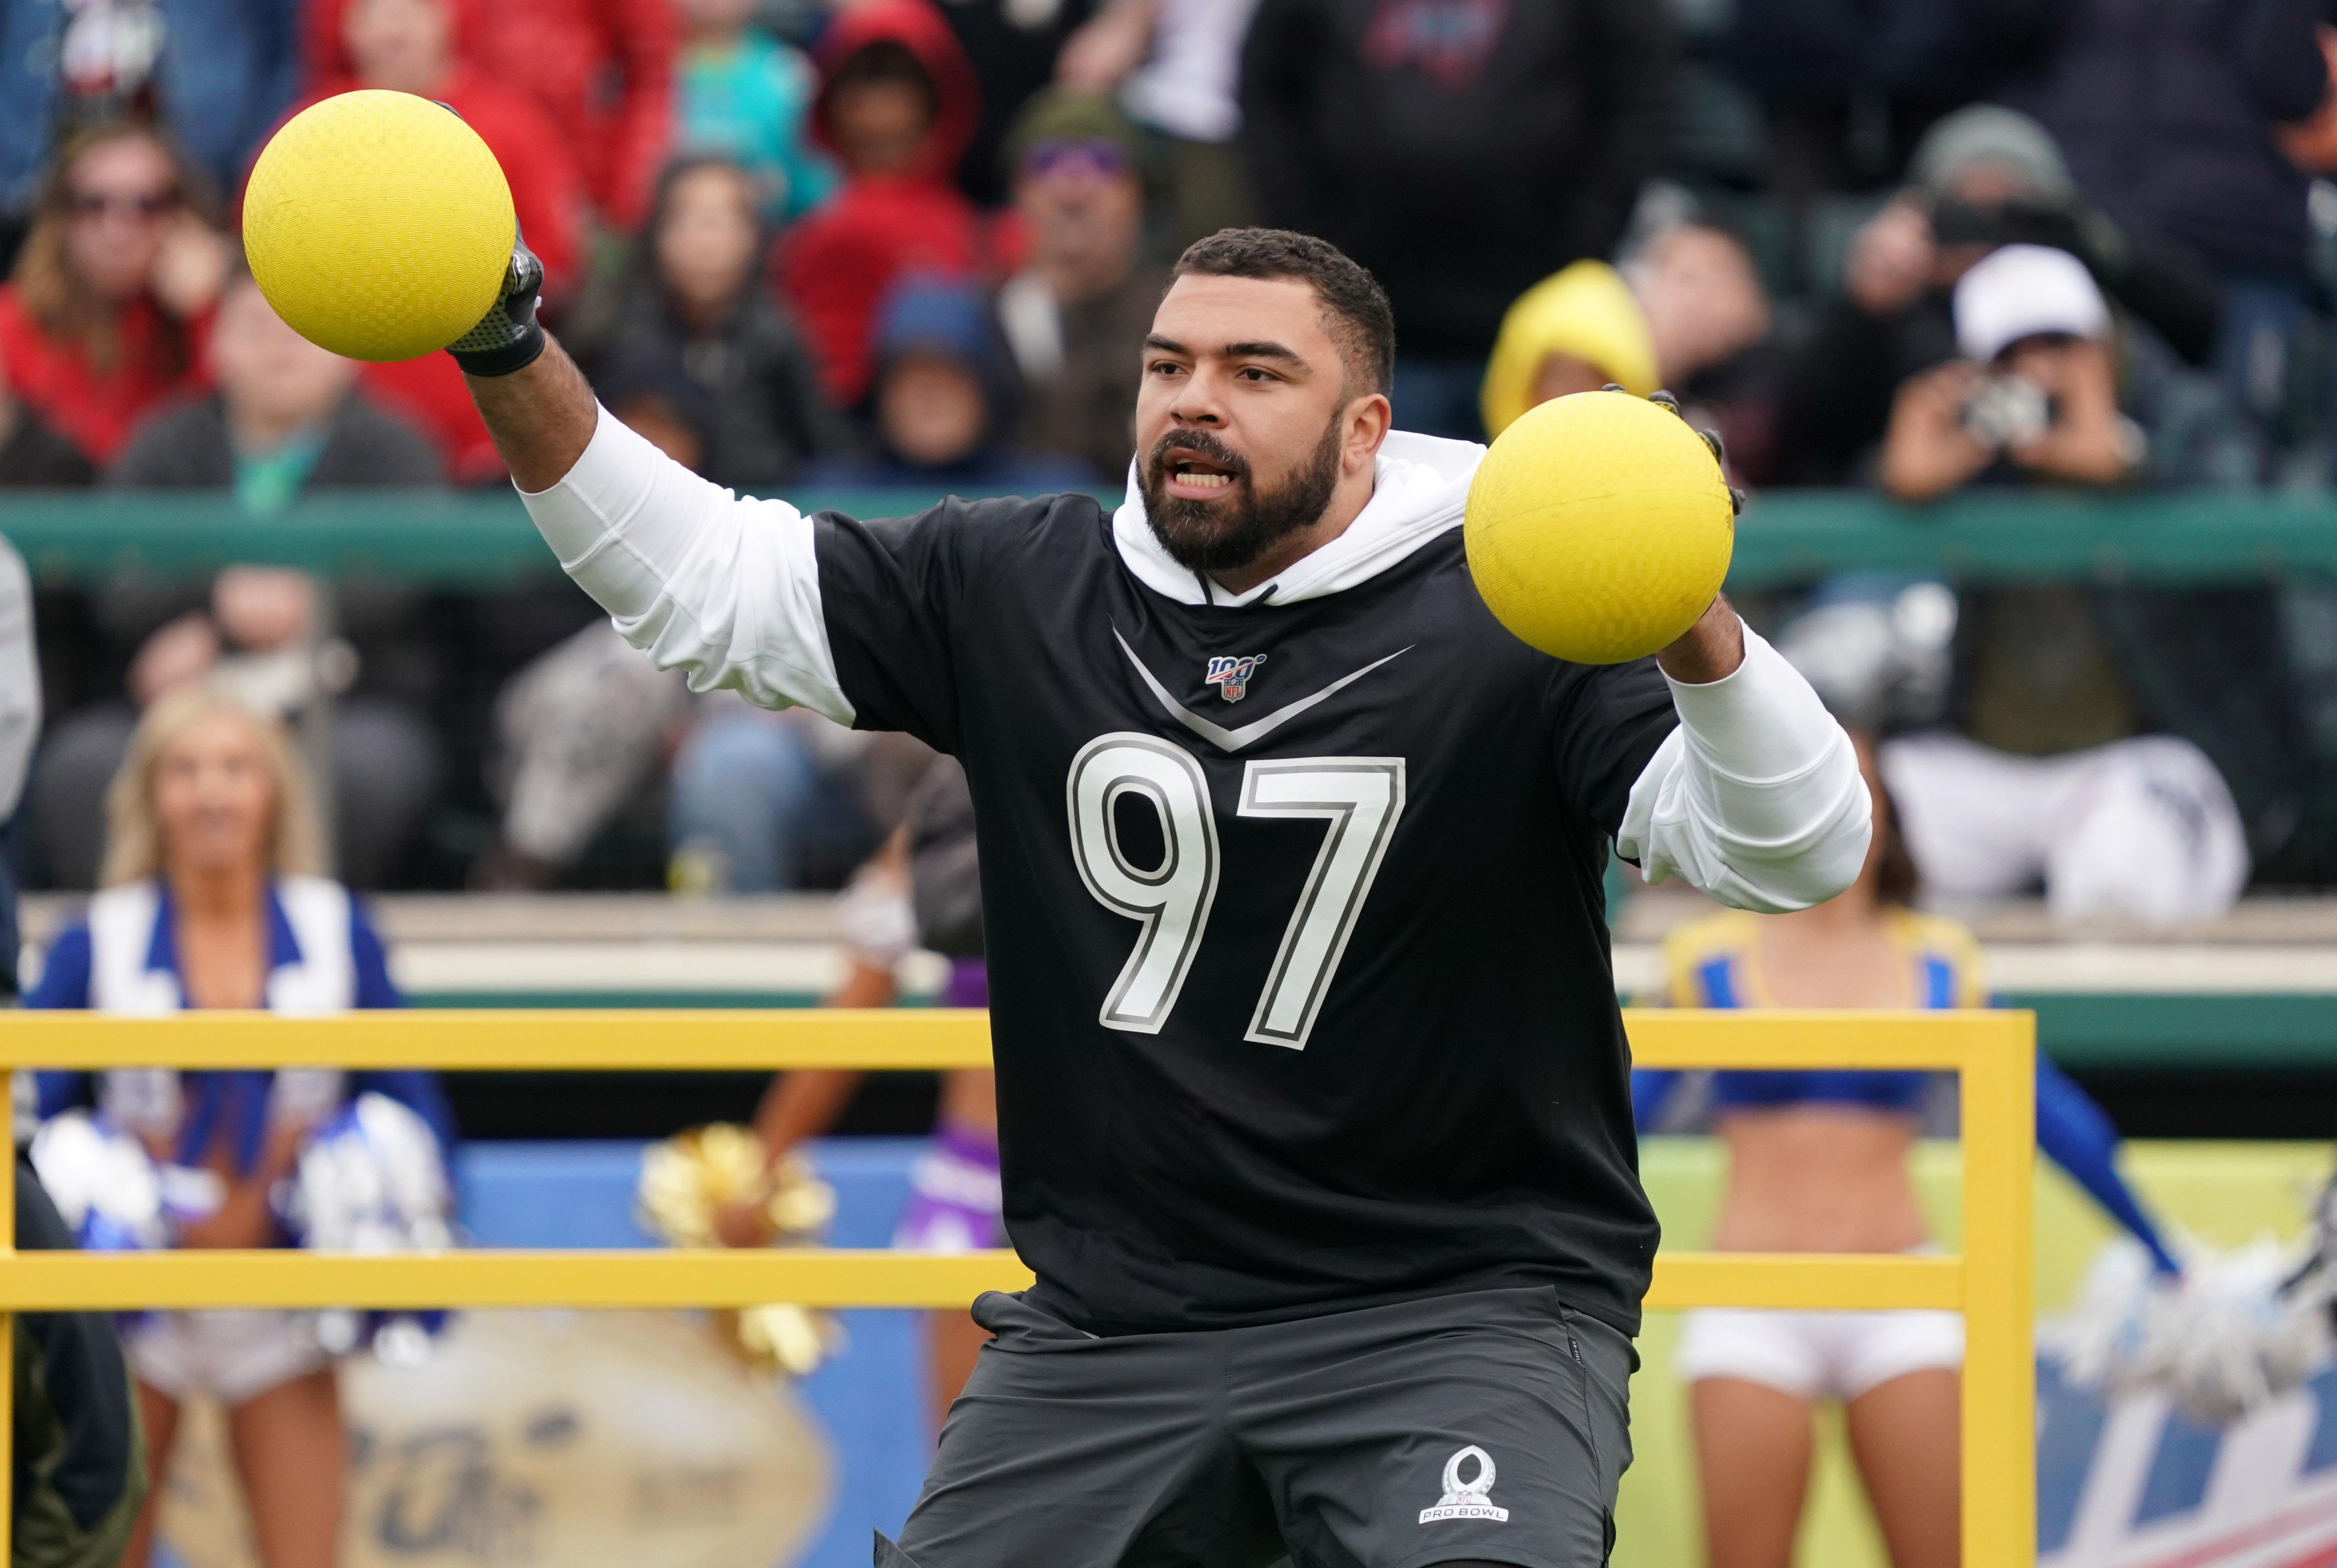 NFL: Pro Bowl Skills Showdown